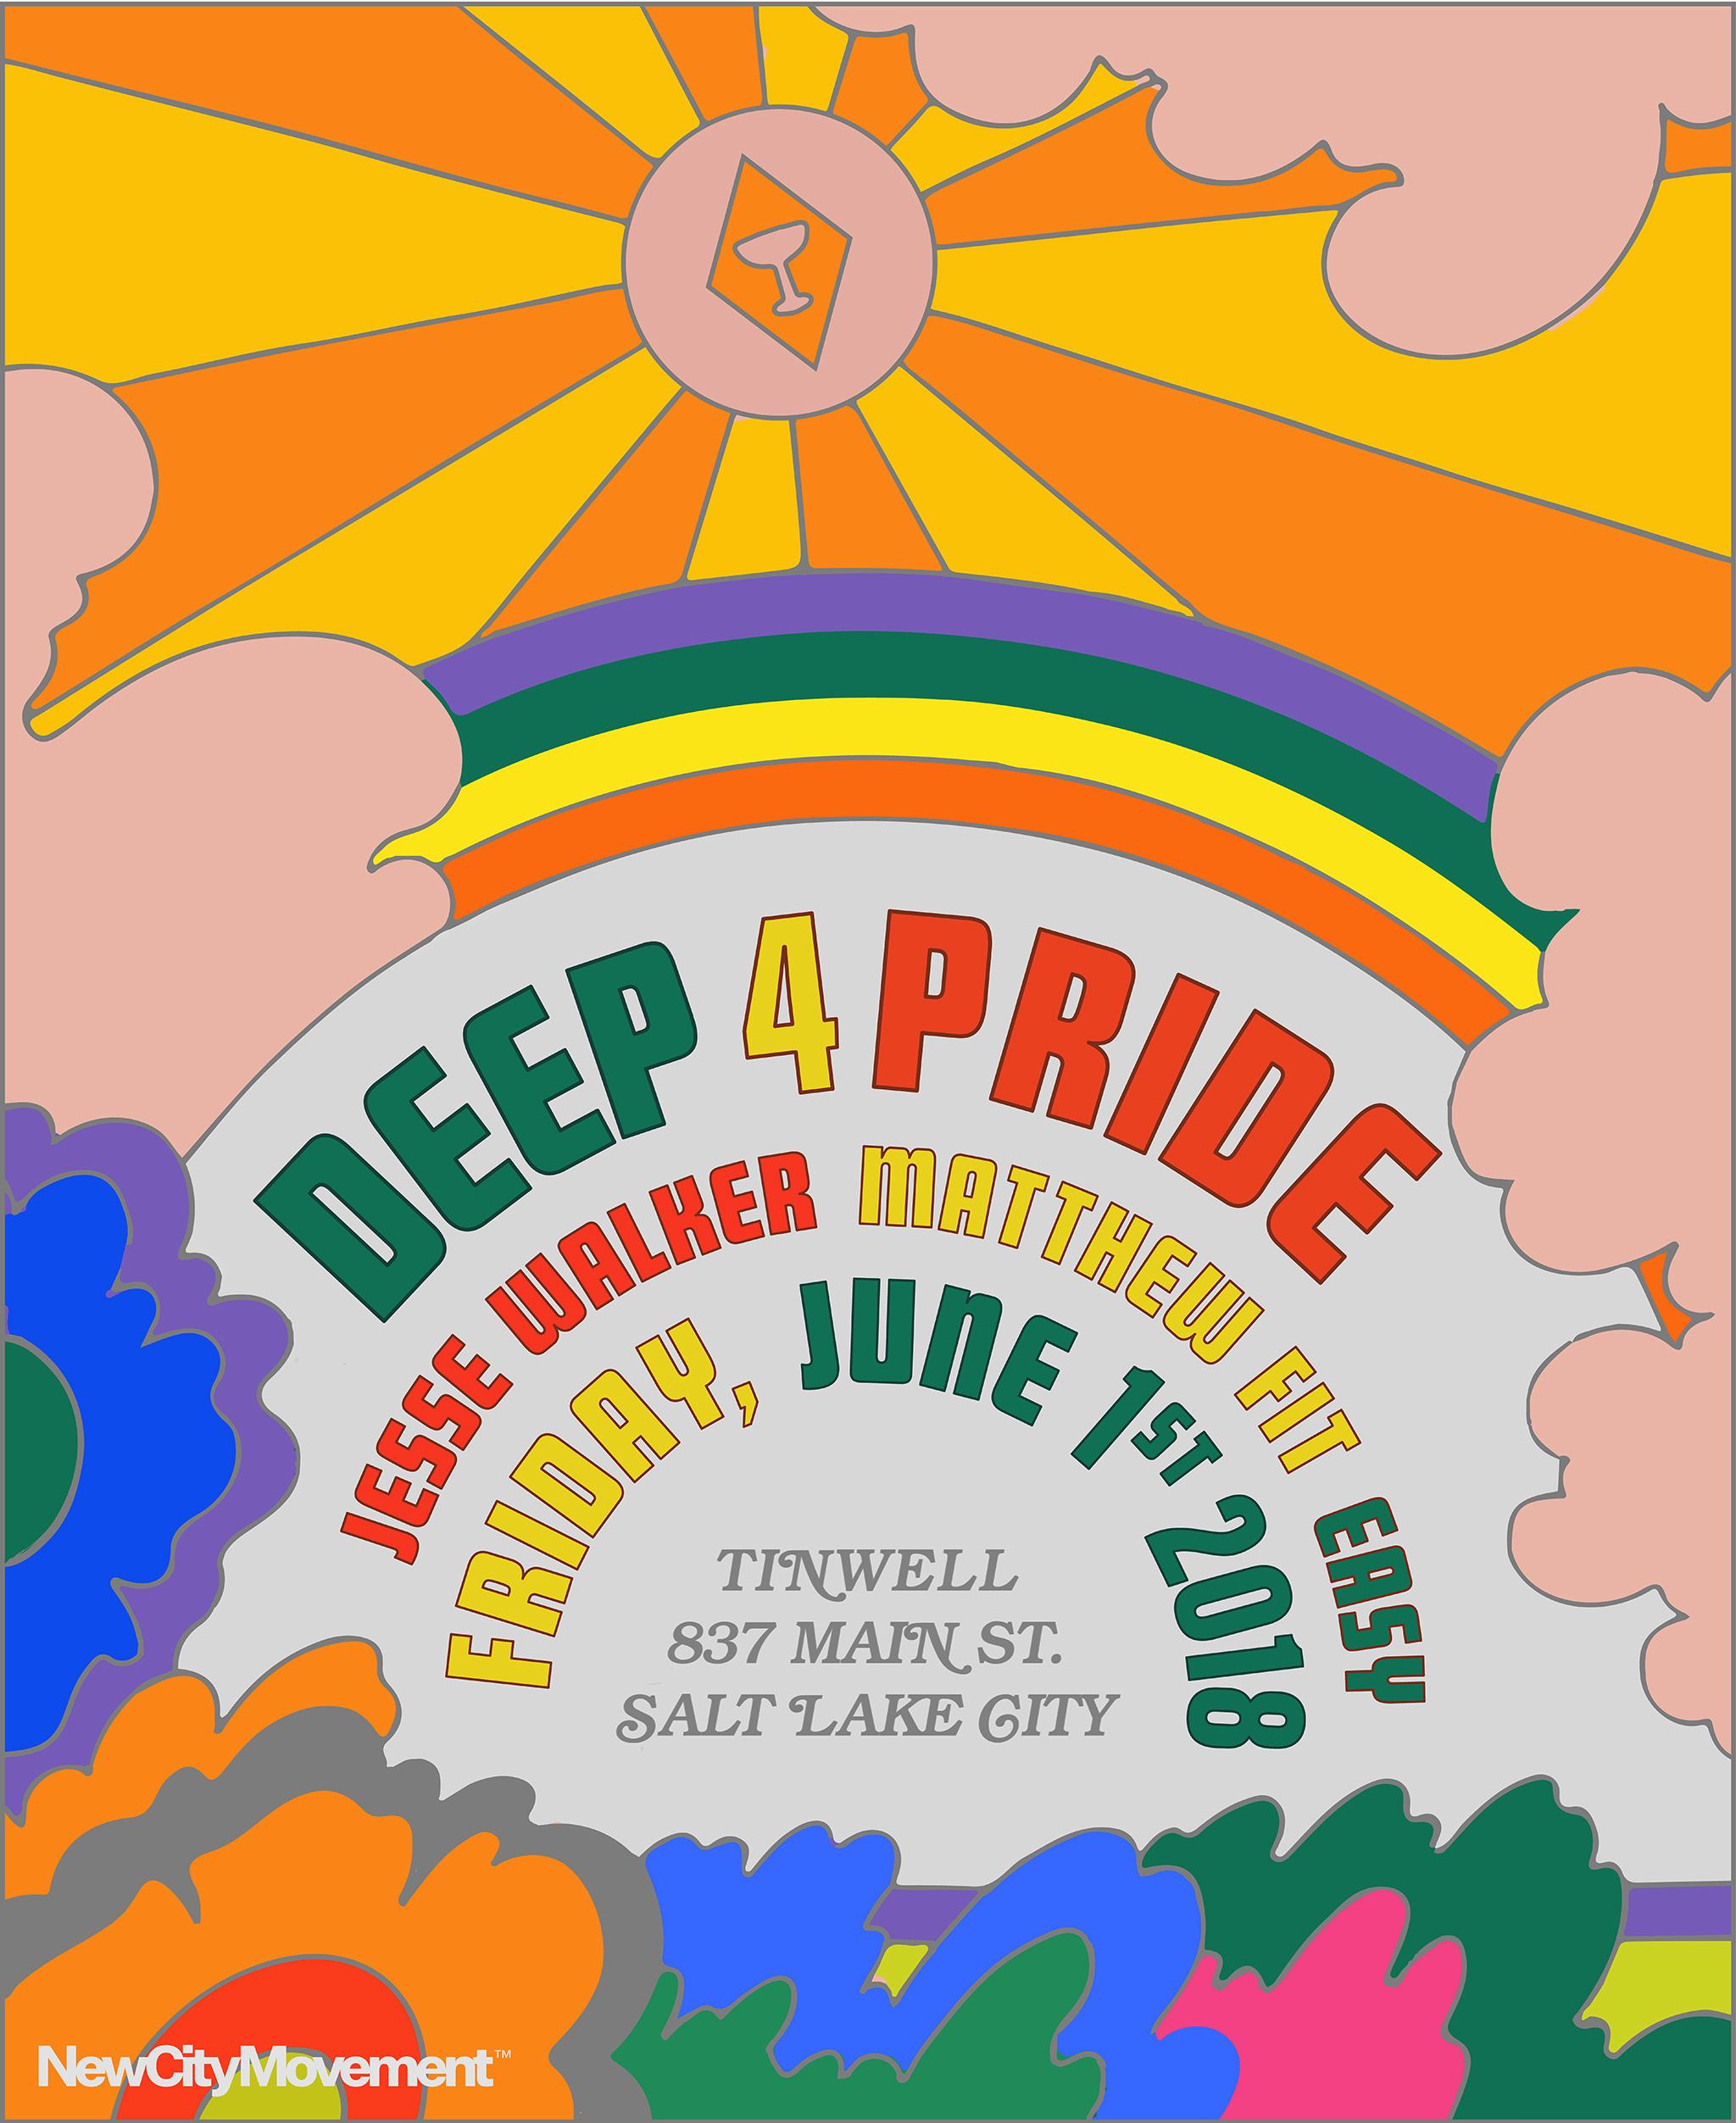 Deep 4 Pride at Tinwell-060118-Pride-Utah-Salt Lake City.jpg